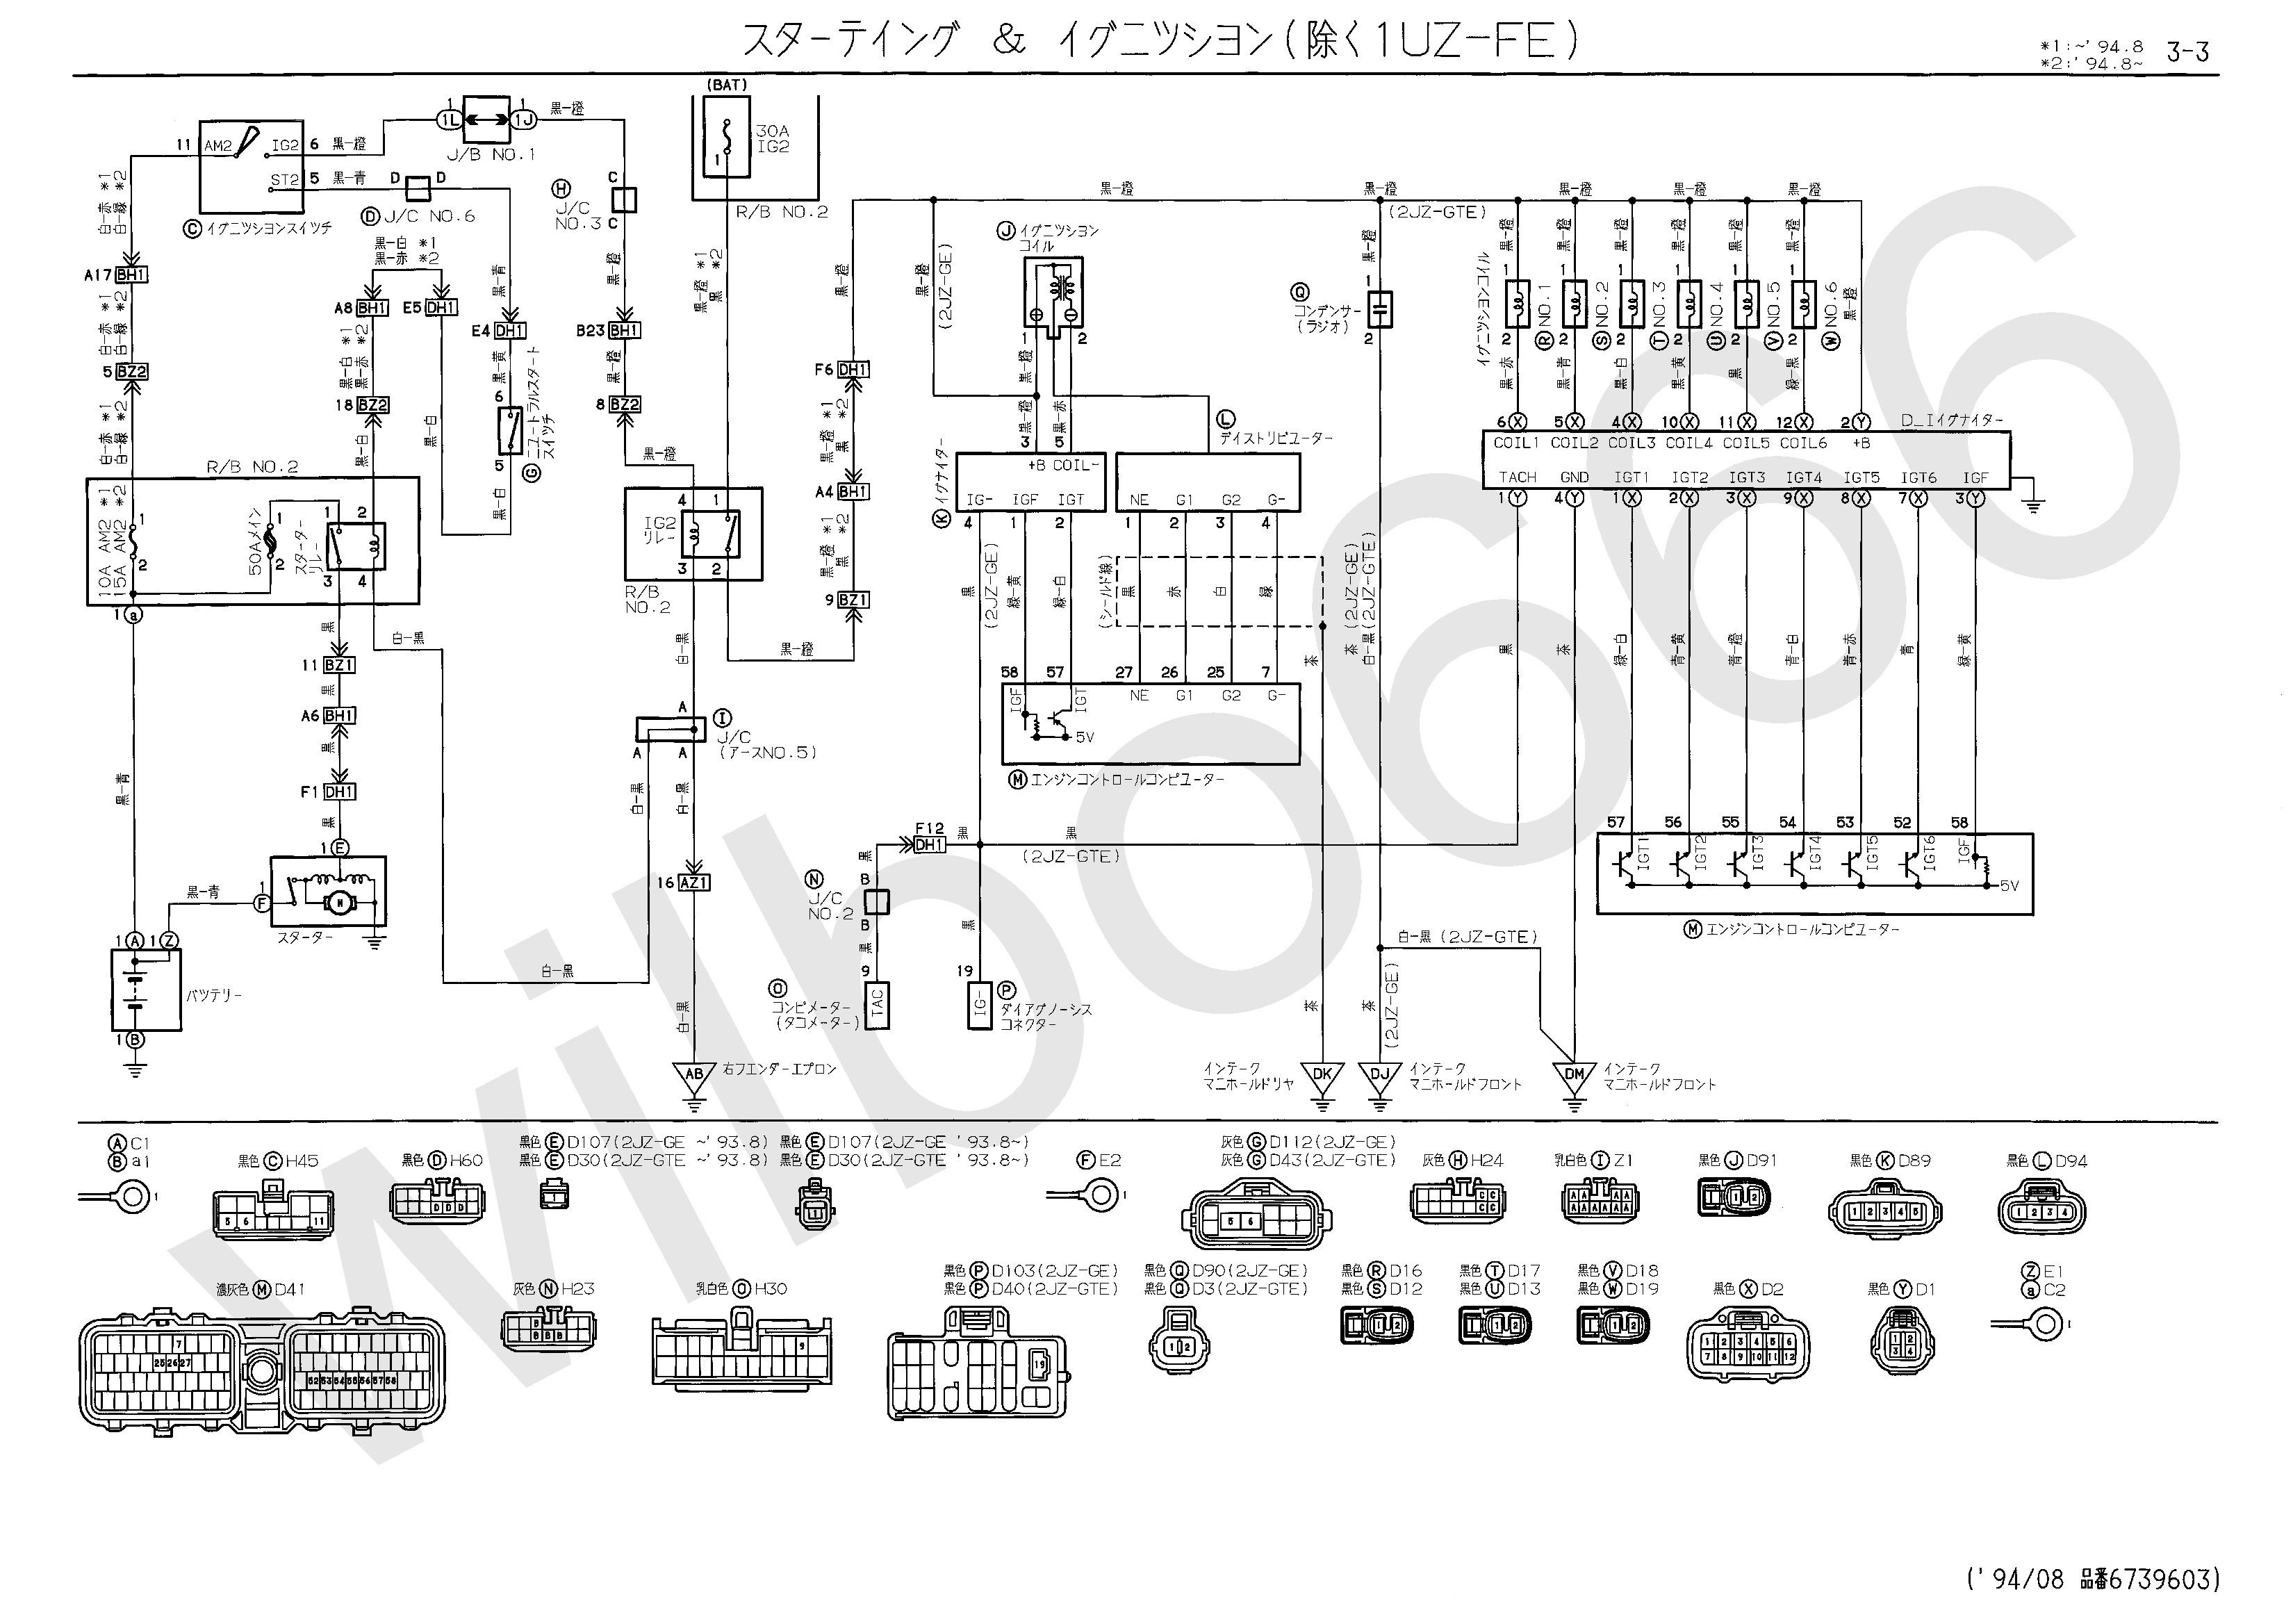 2007 peterbilt 379 wiring diagram ga 9149  1990 peterbilt 379 headlight wiring diagram free diagram  1990 peterbilt 379 headlight wiring